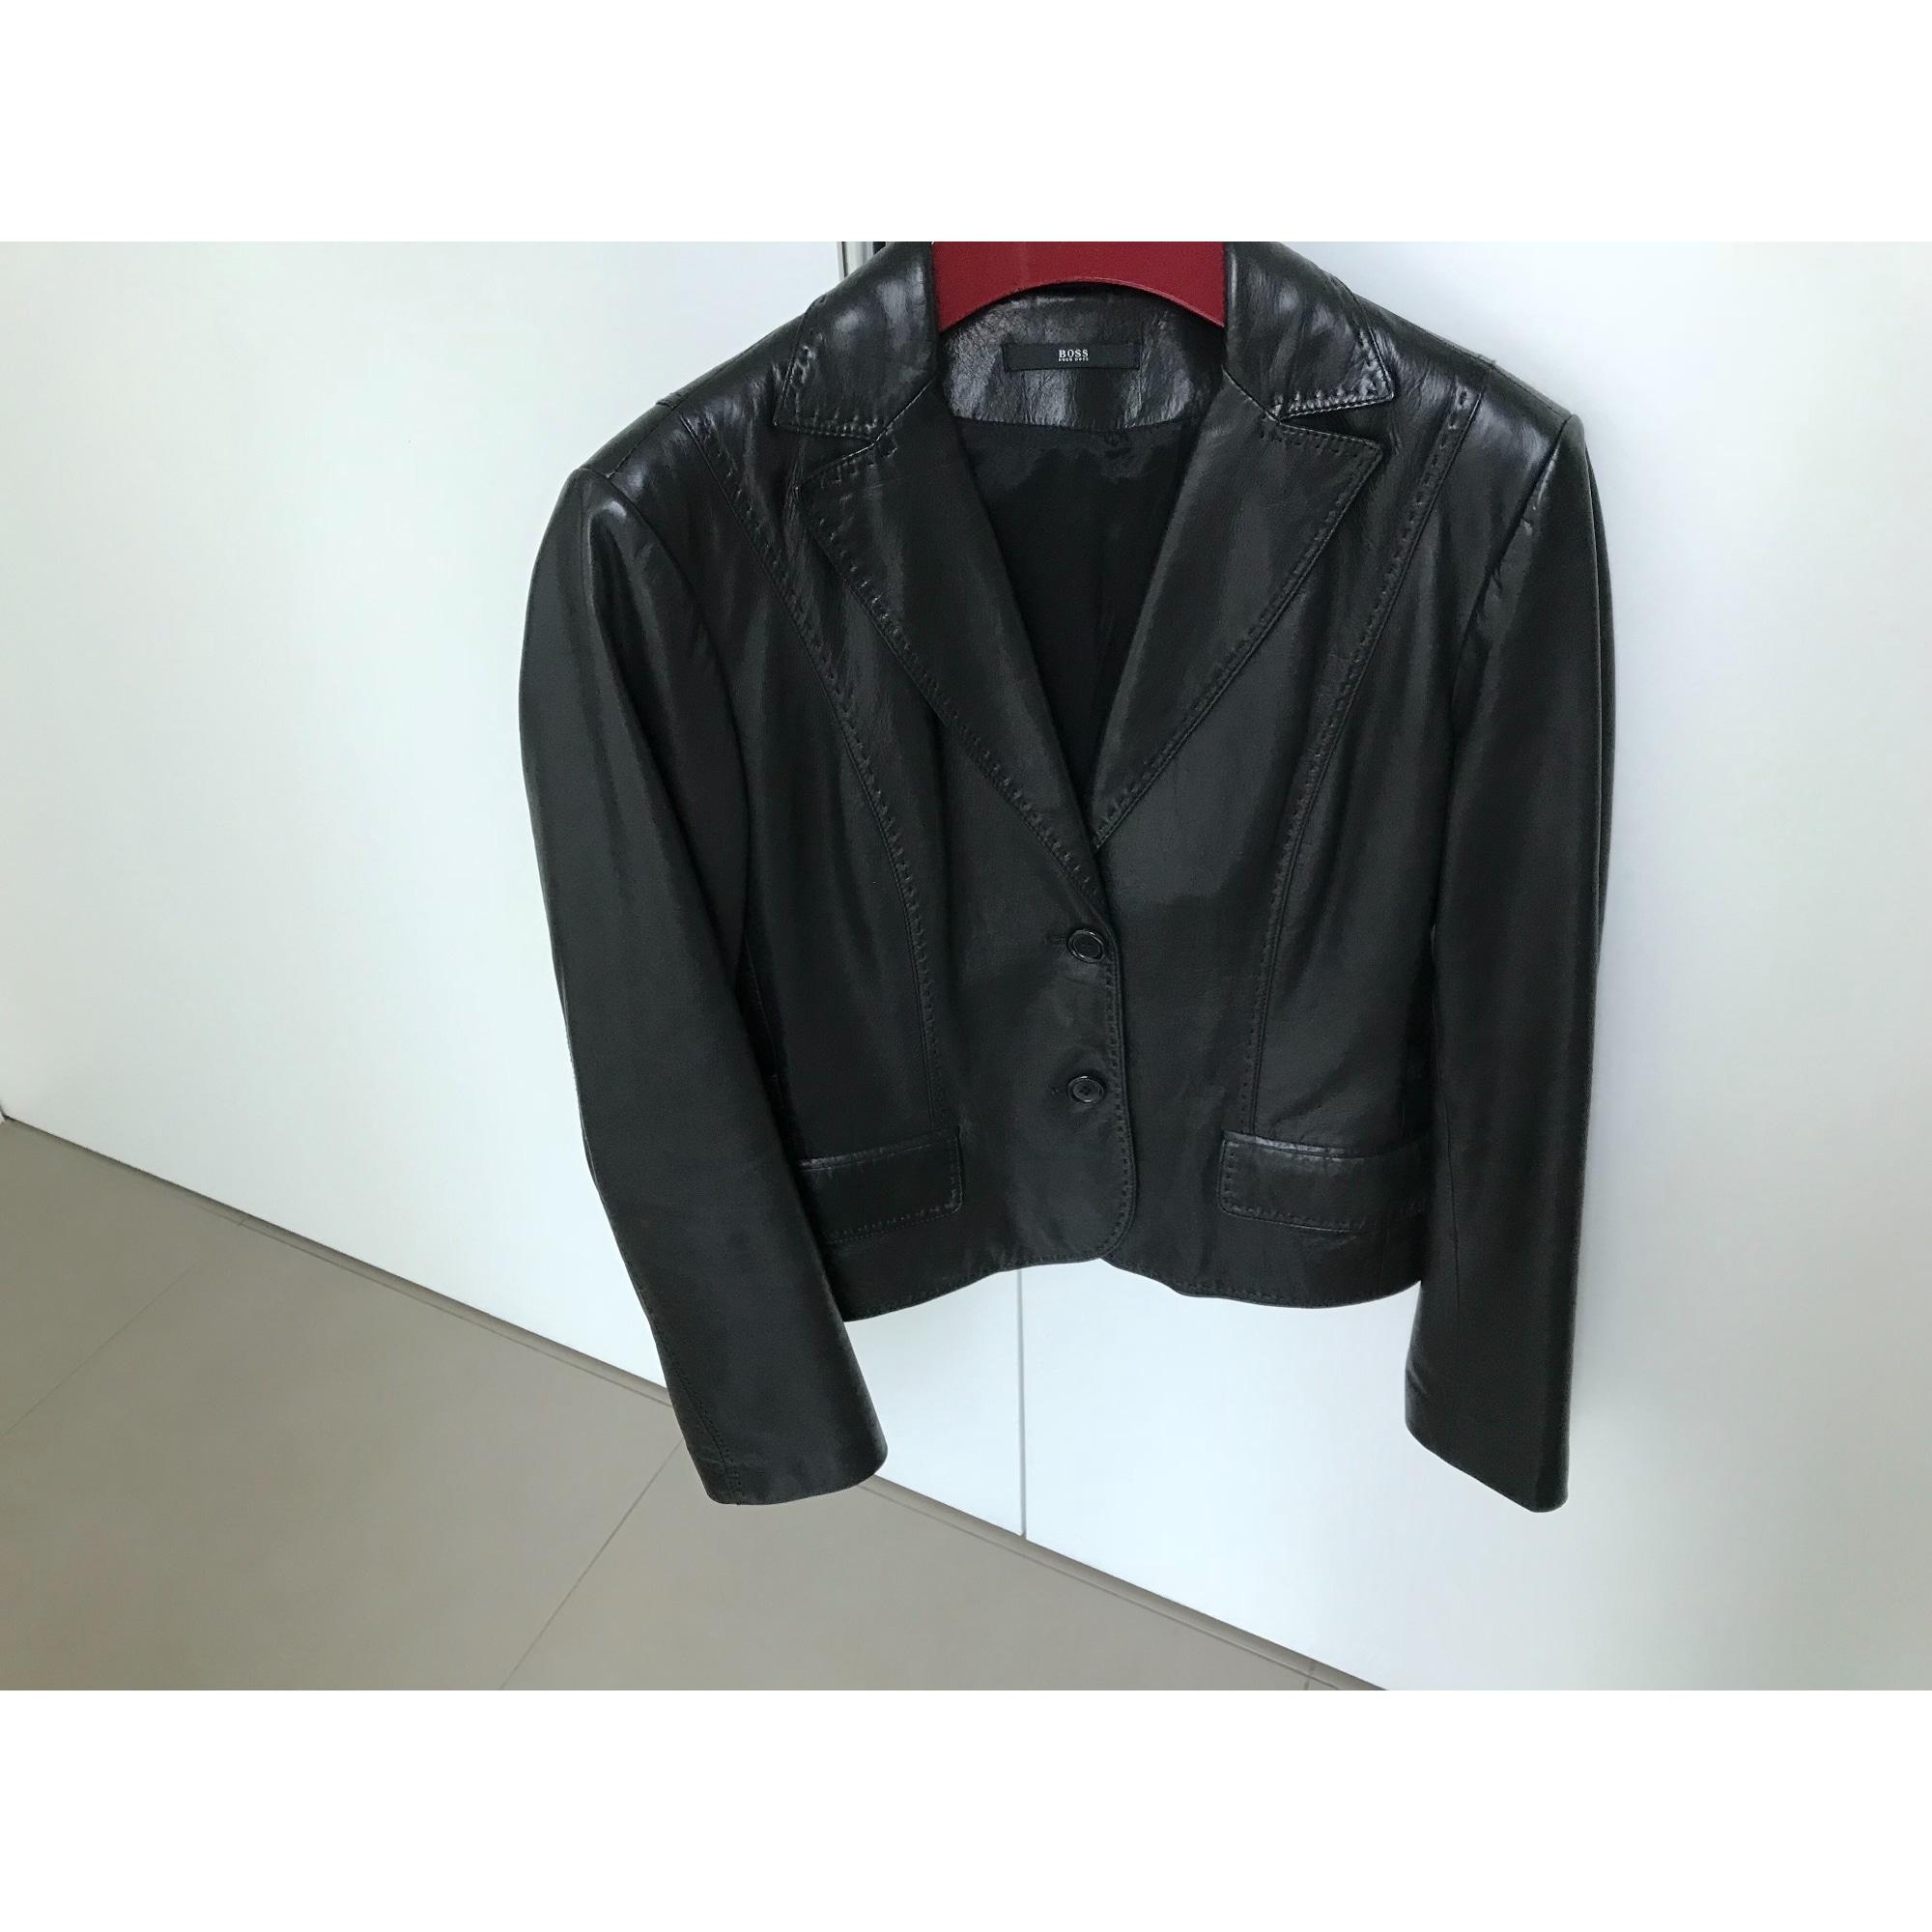 Veste en cuir HUGO BOSS 38 (M, T2) noir -